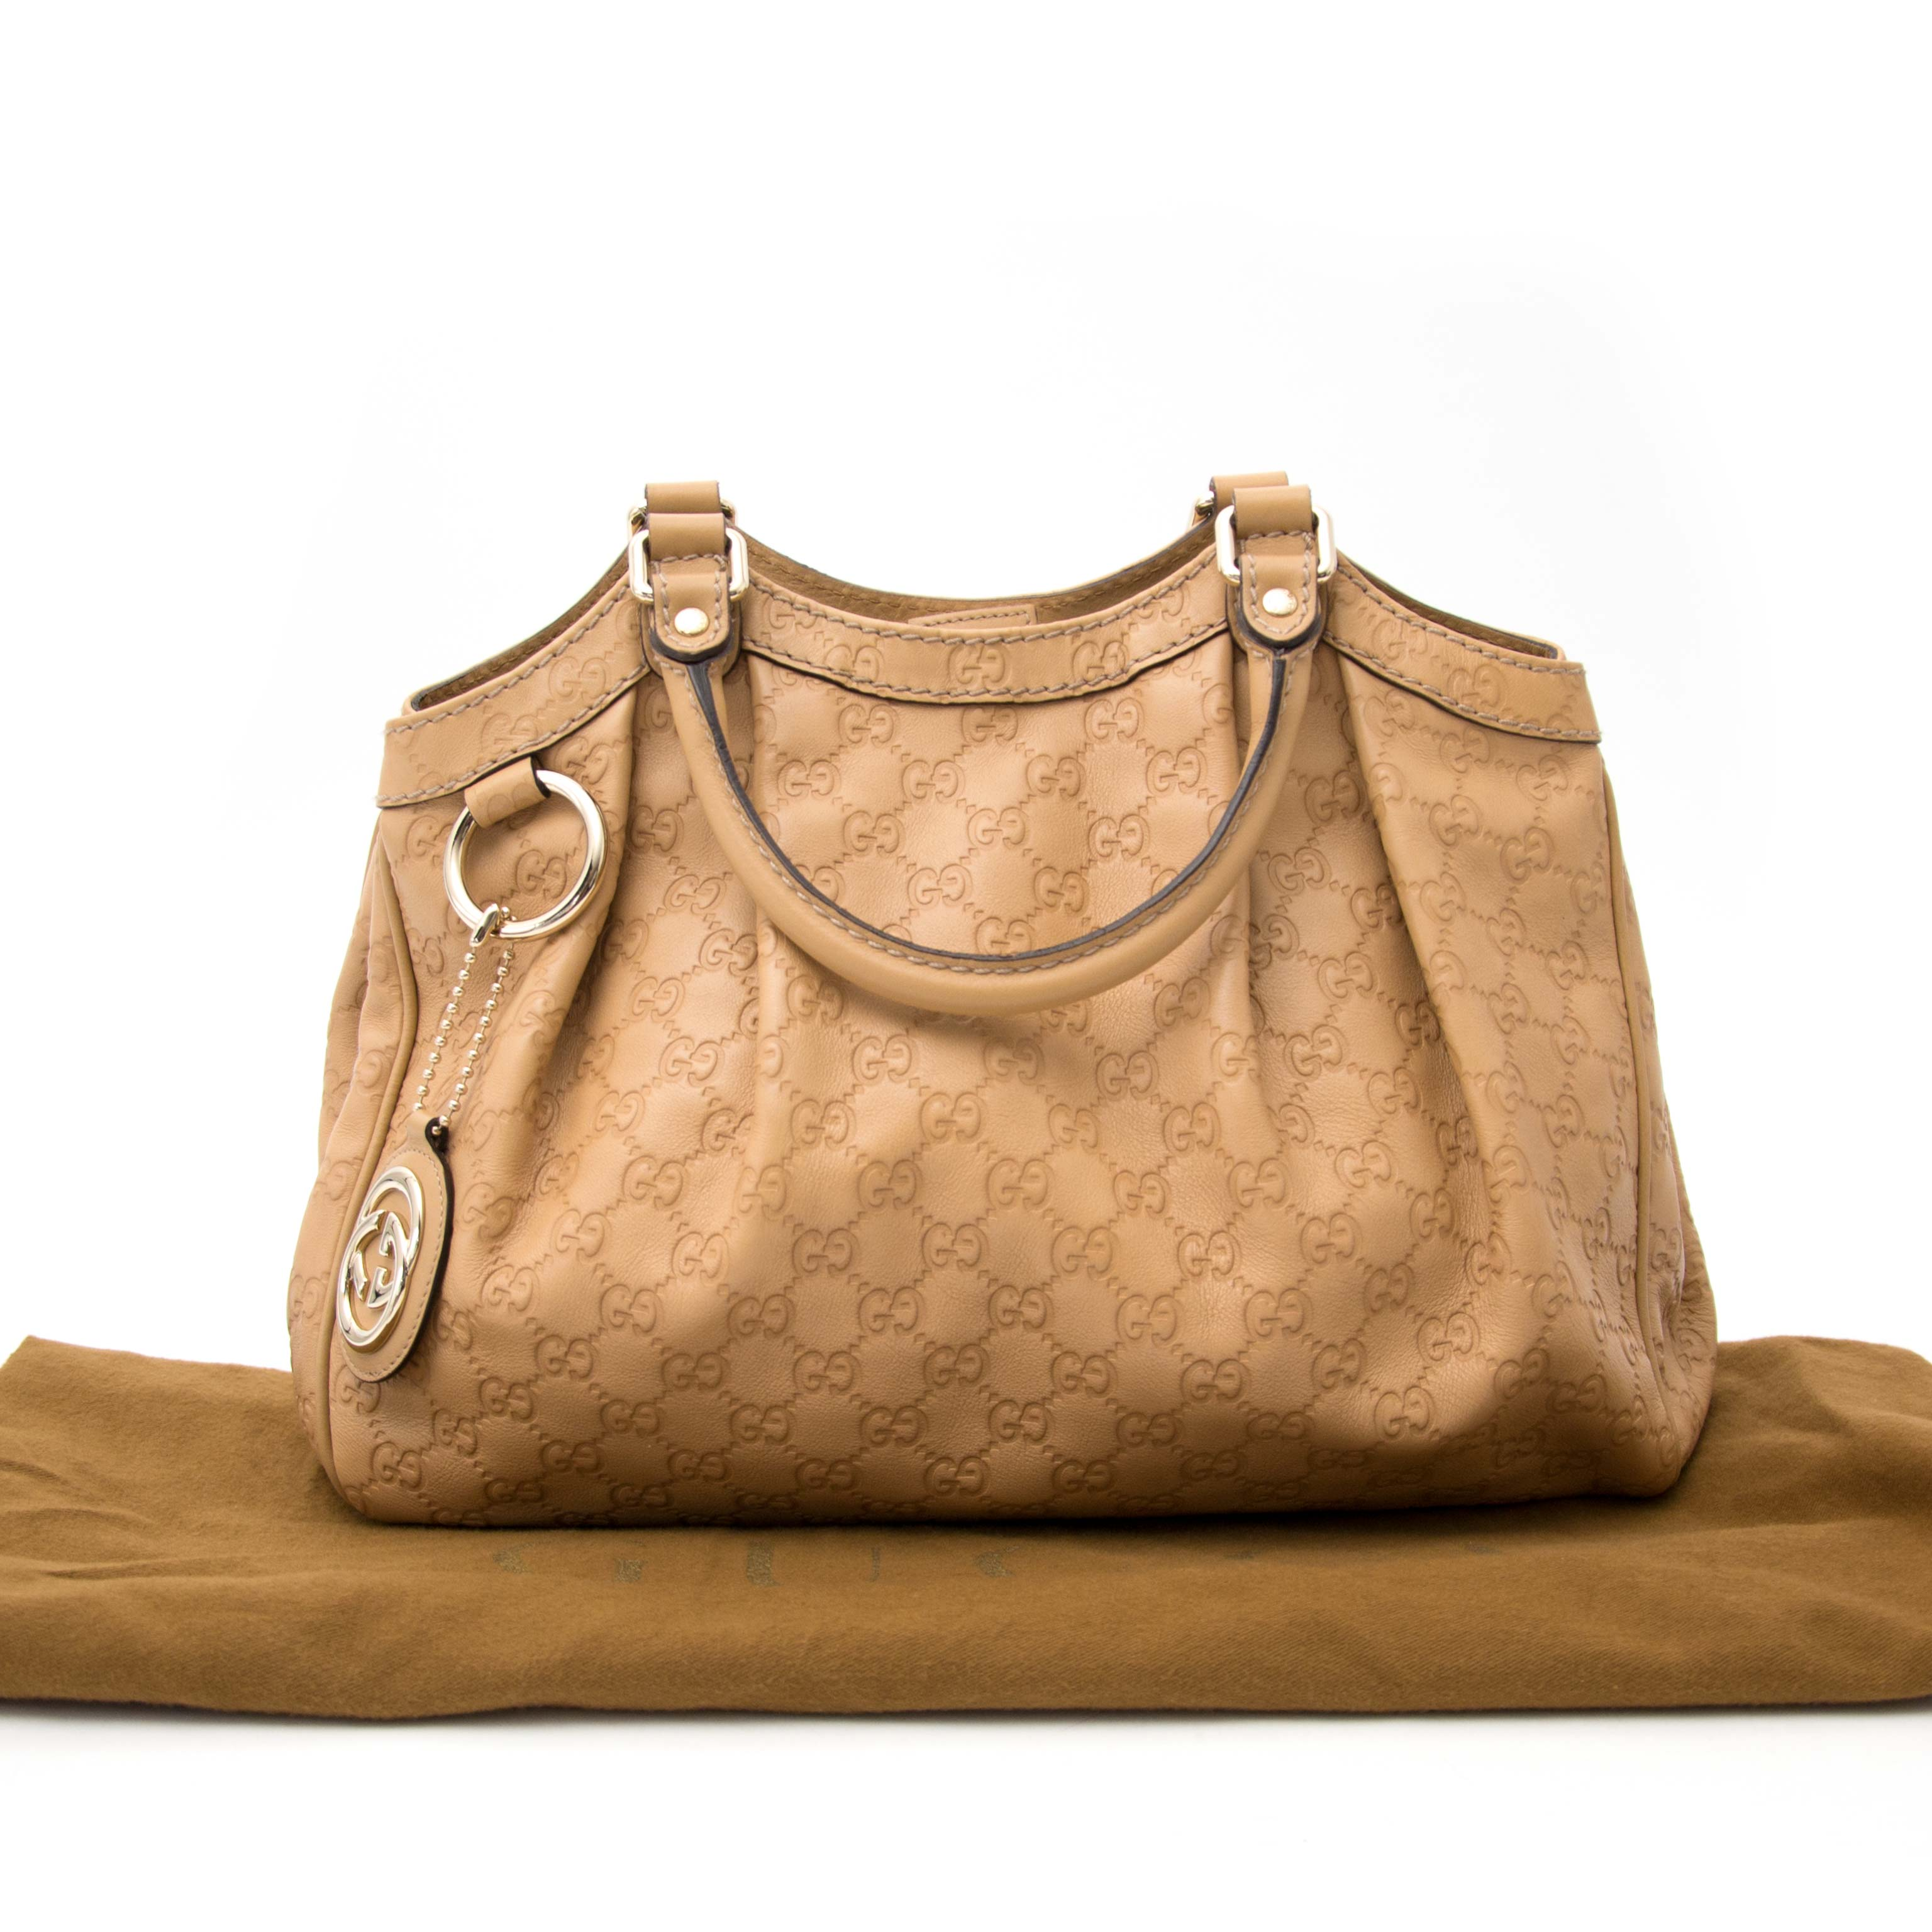 ... acheter en ligne chez labellov.com pour le meilleur prix gucci beige  guccissima sukey 812b7c0fa28